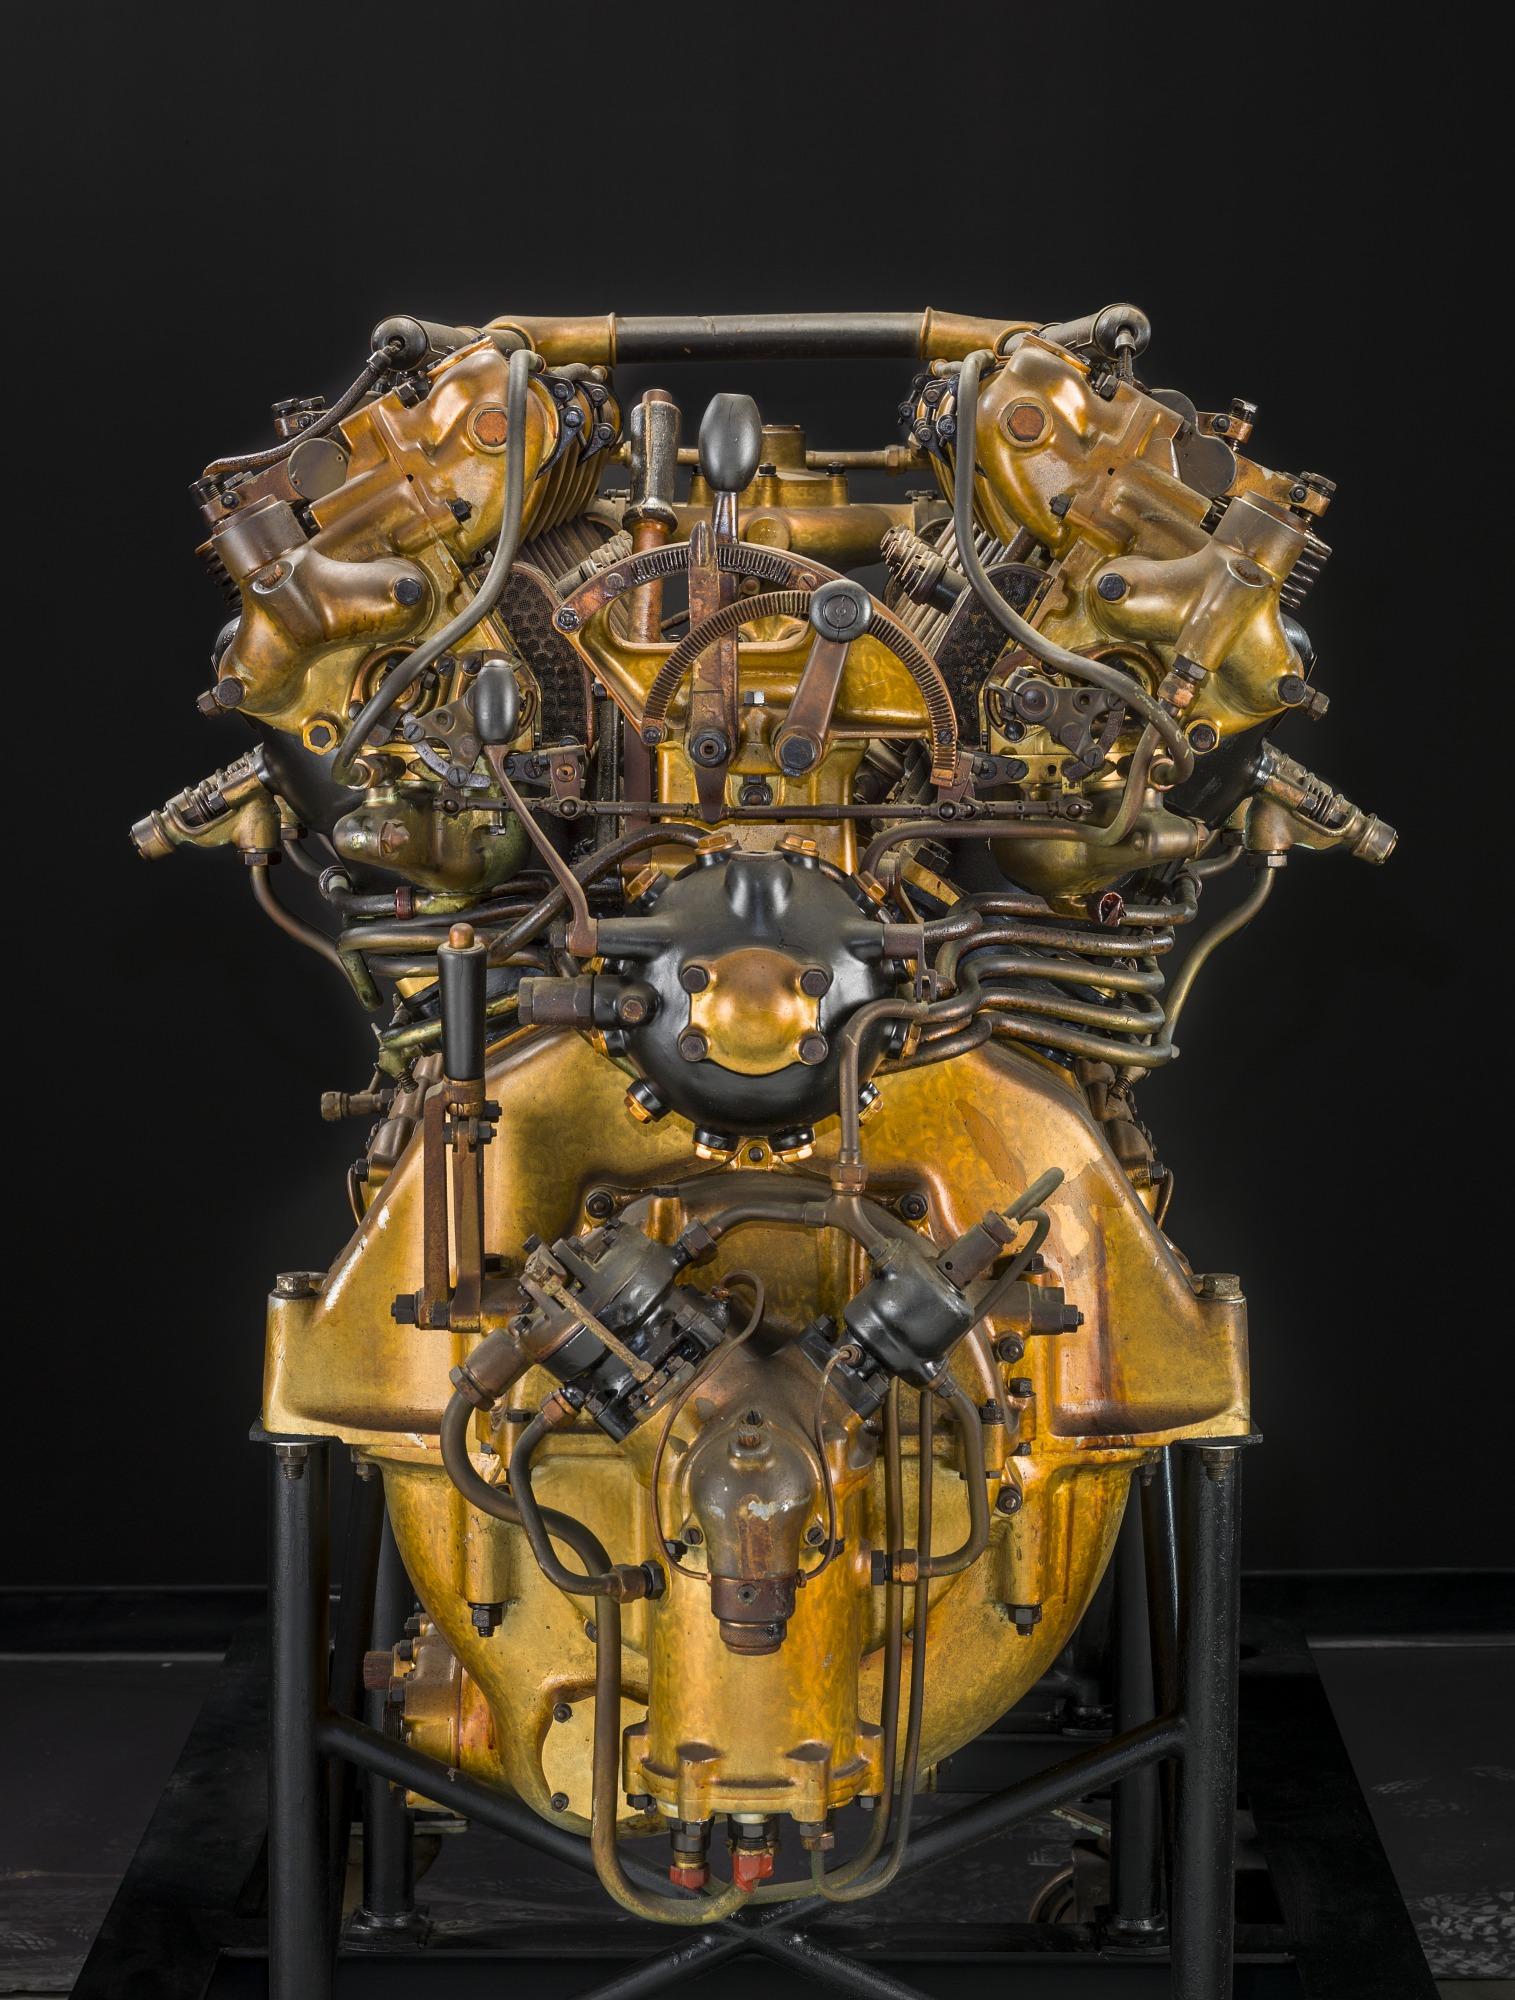 Maybach VL-2, V-12 Engine - Image version 6